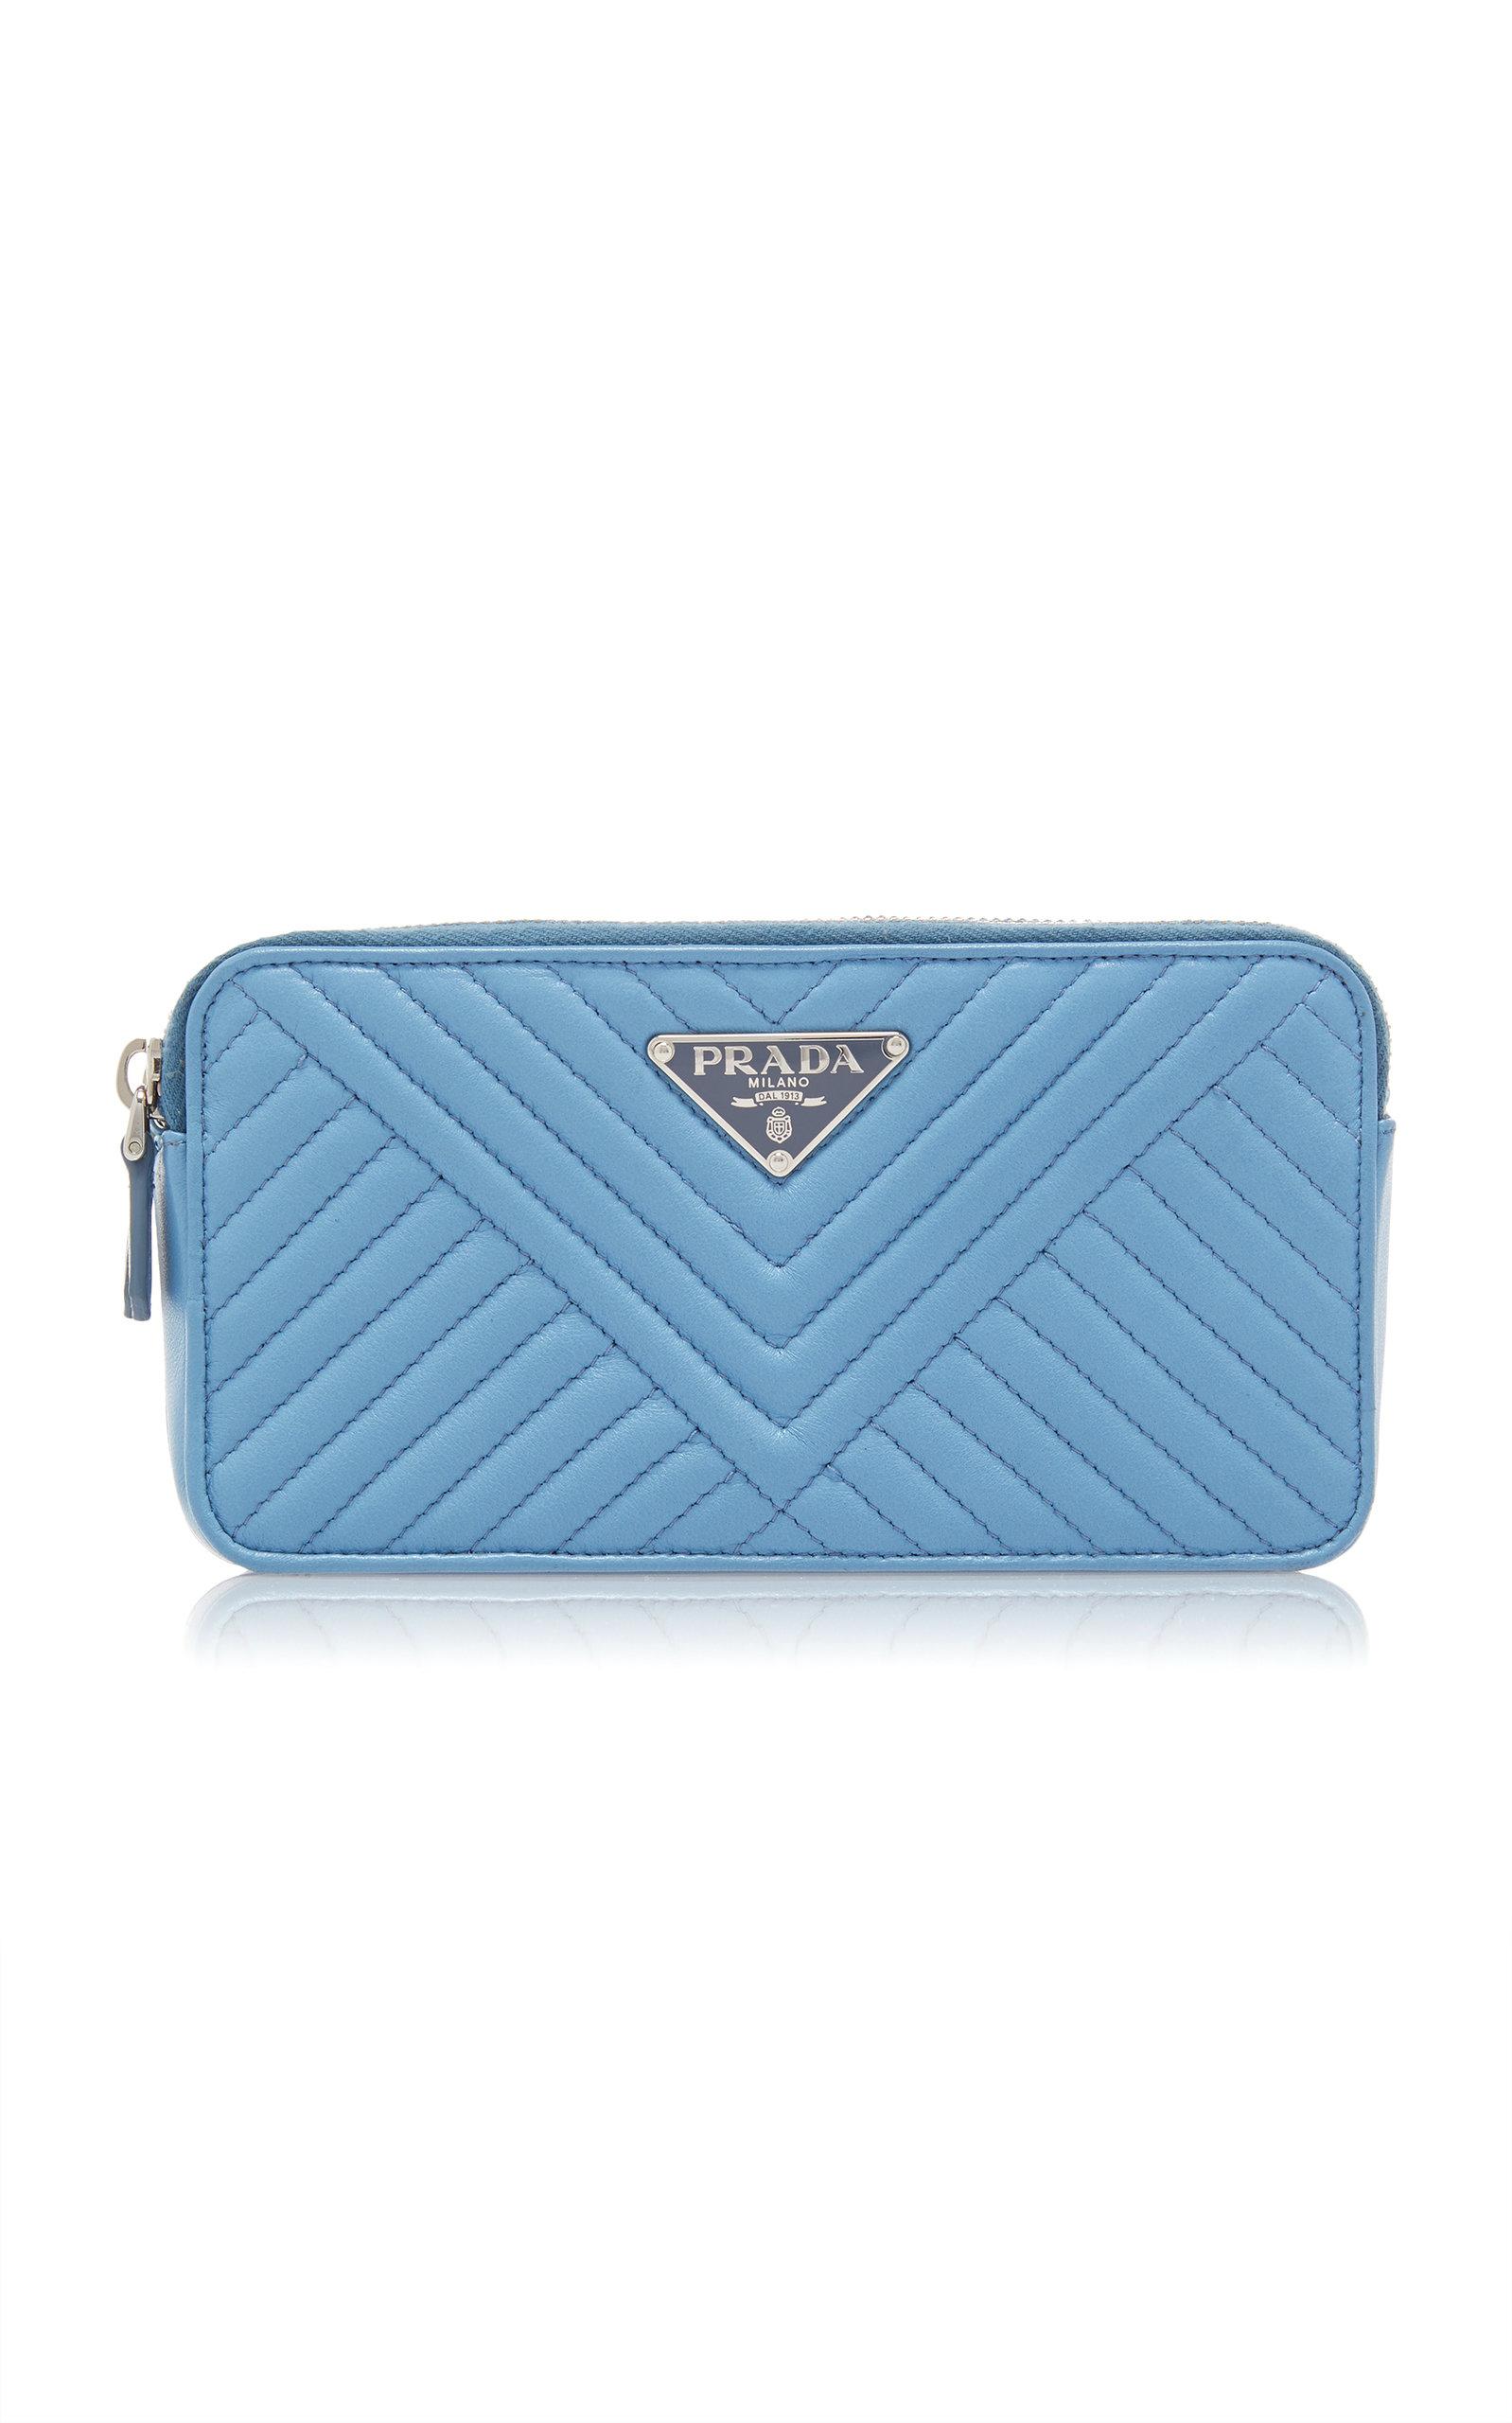 ... australia prada quilted leather wallet blue e5b4f d38f1 125dbb1d18aff